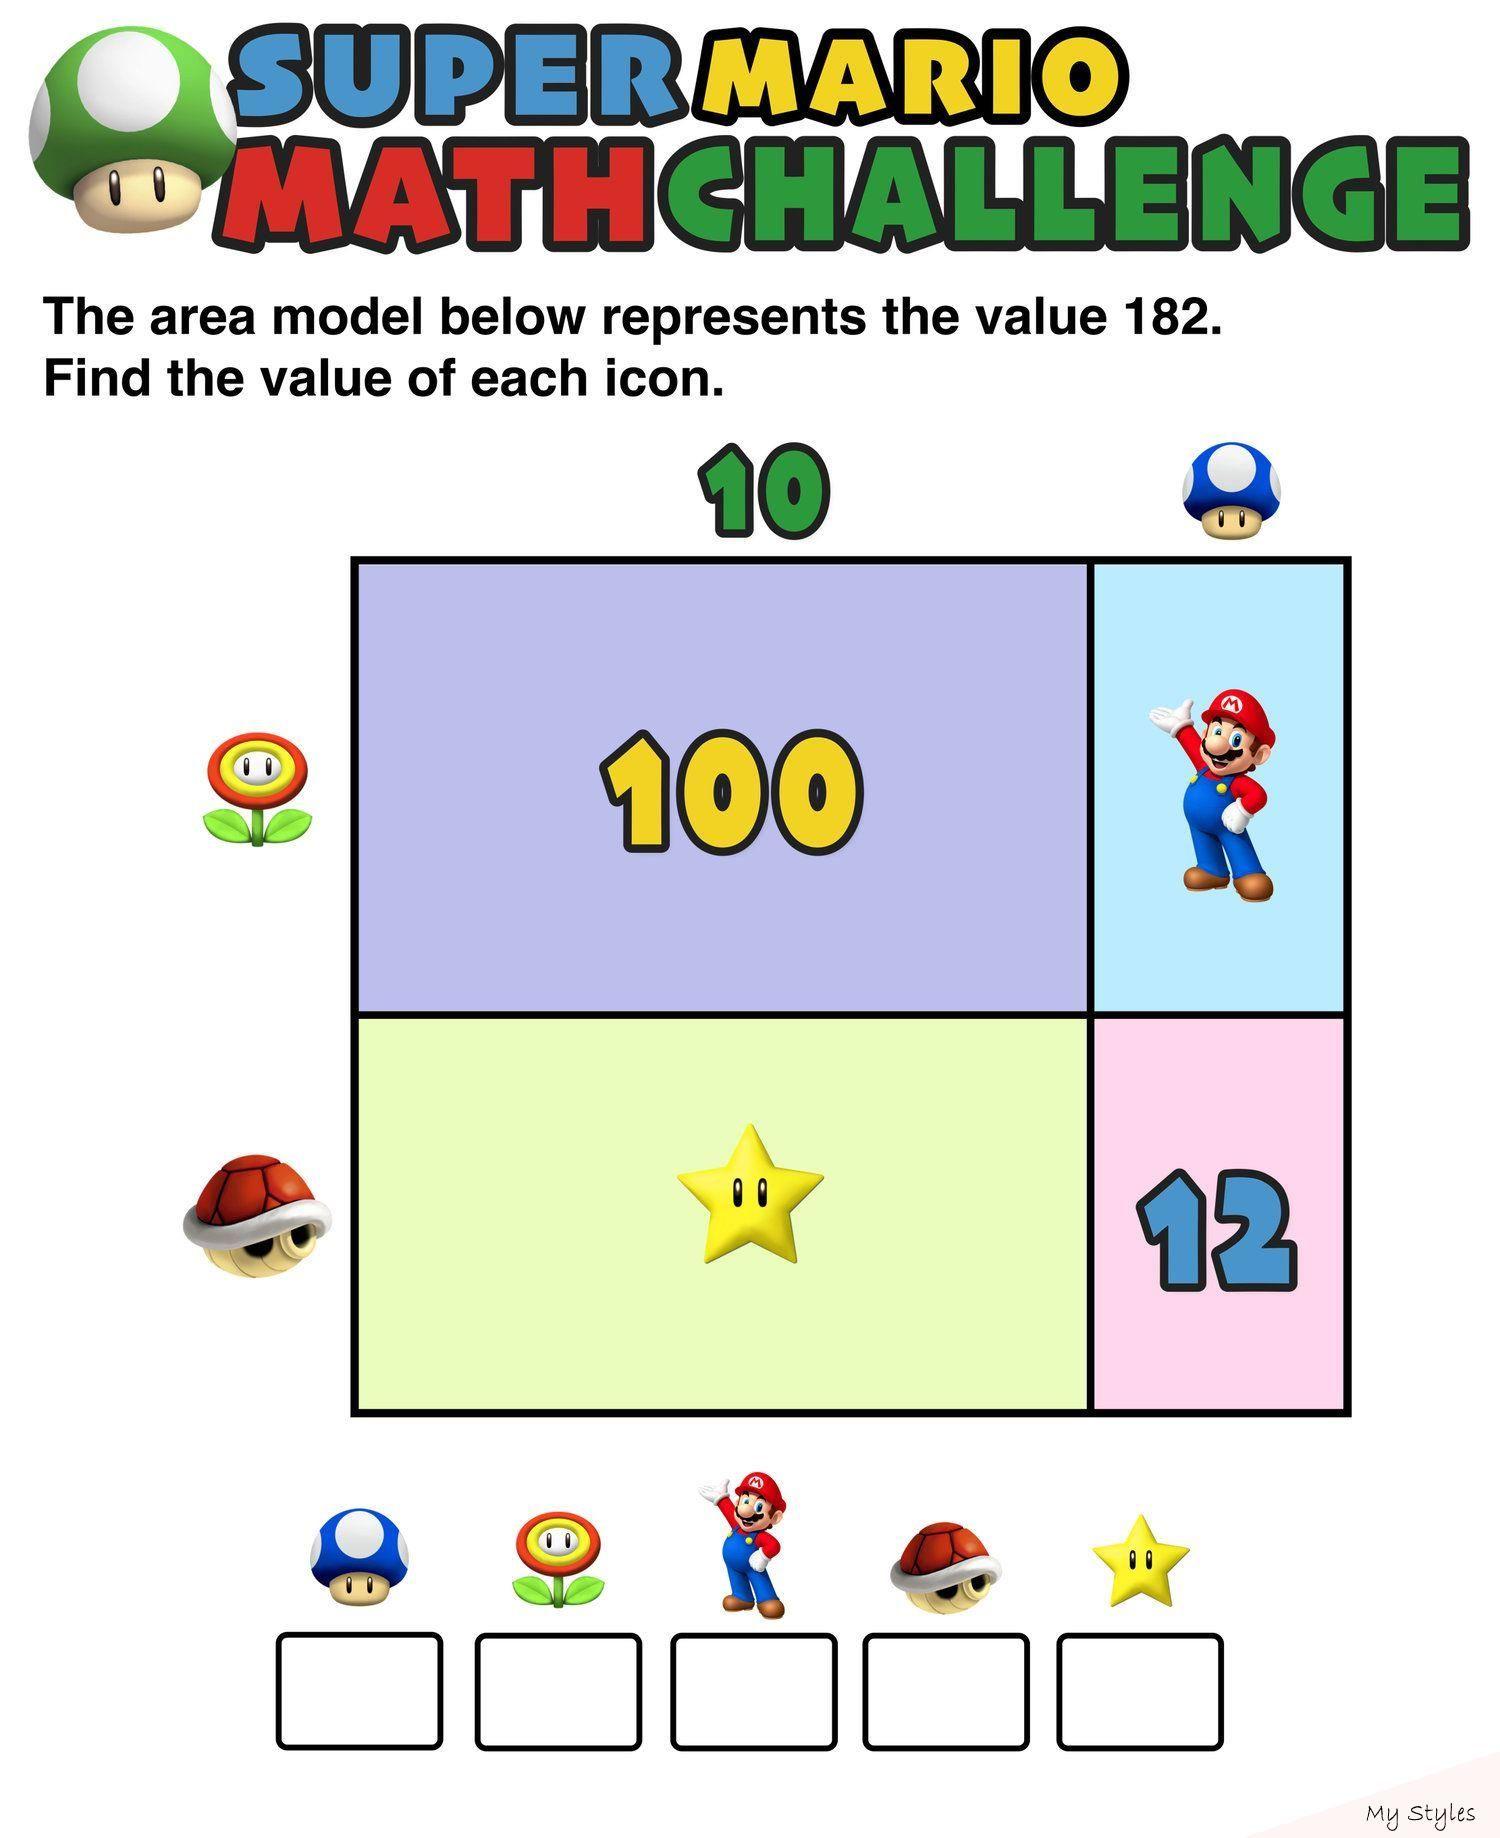 Have You Seen These Free Super Mario Math Puzzles Mashup Math Math For Kids Maths Puzzles Math Visuals Math [ 1838 x 1500 Pixel ]